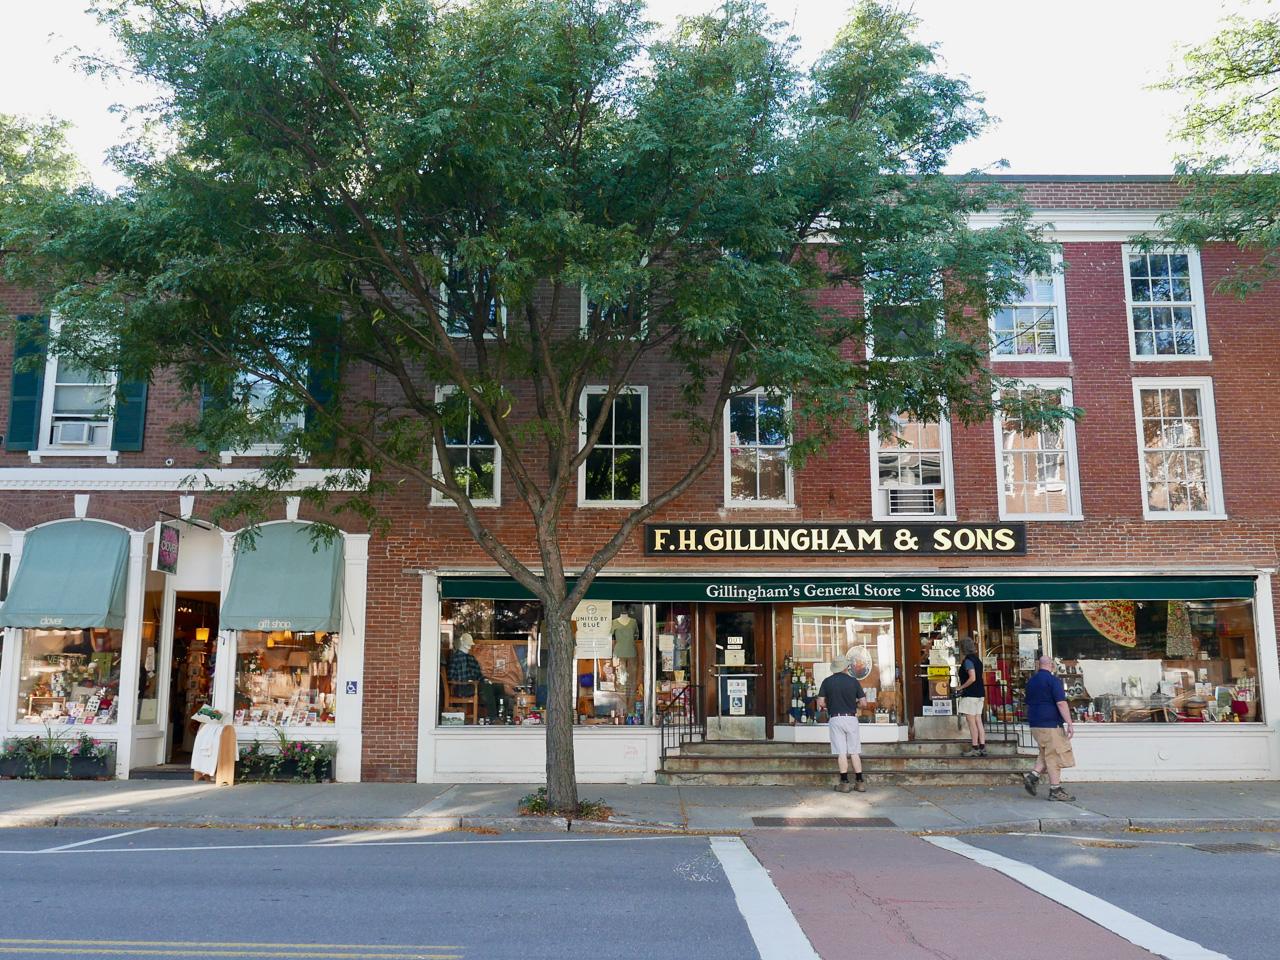 Cara Sharratt Travel - Gillingham's General Store - Since 1886 - Woodstock, Vermont